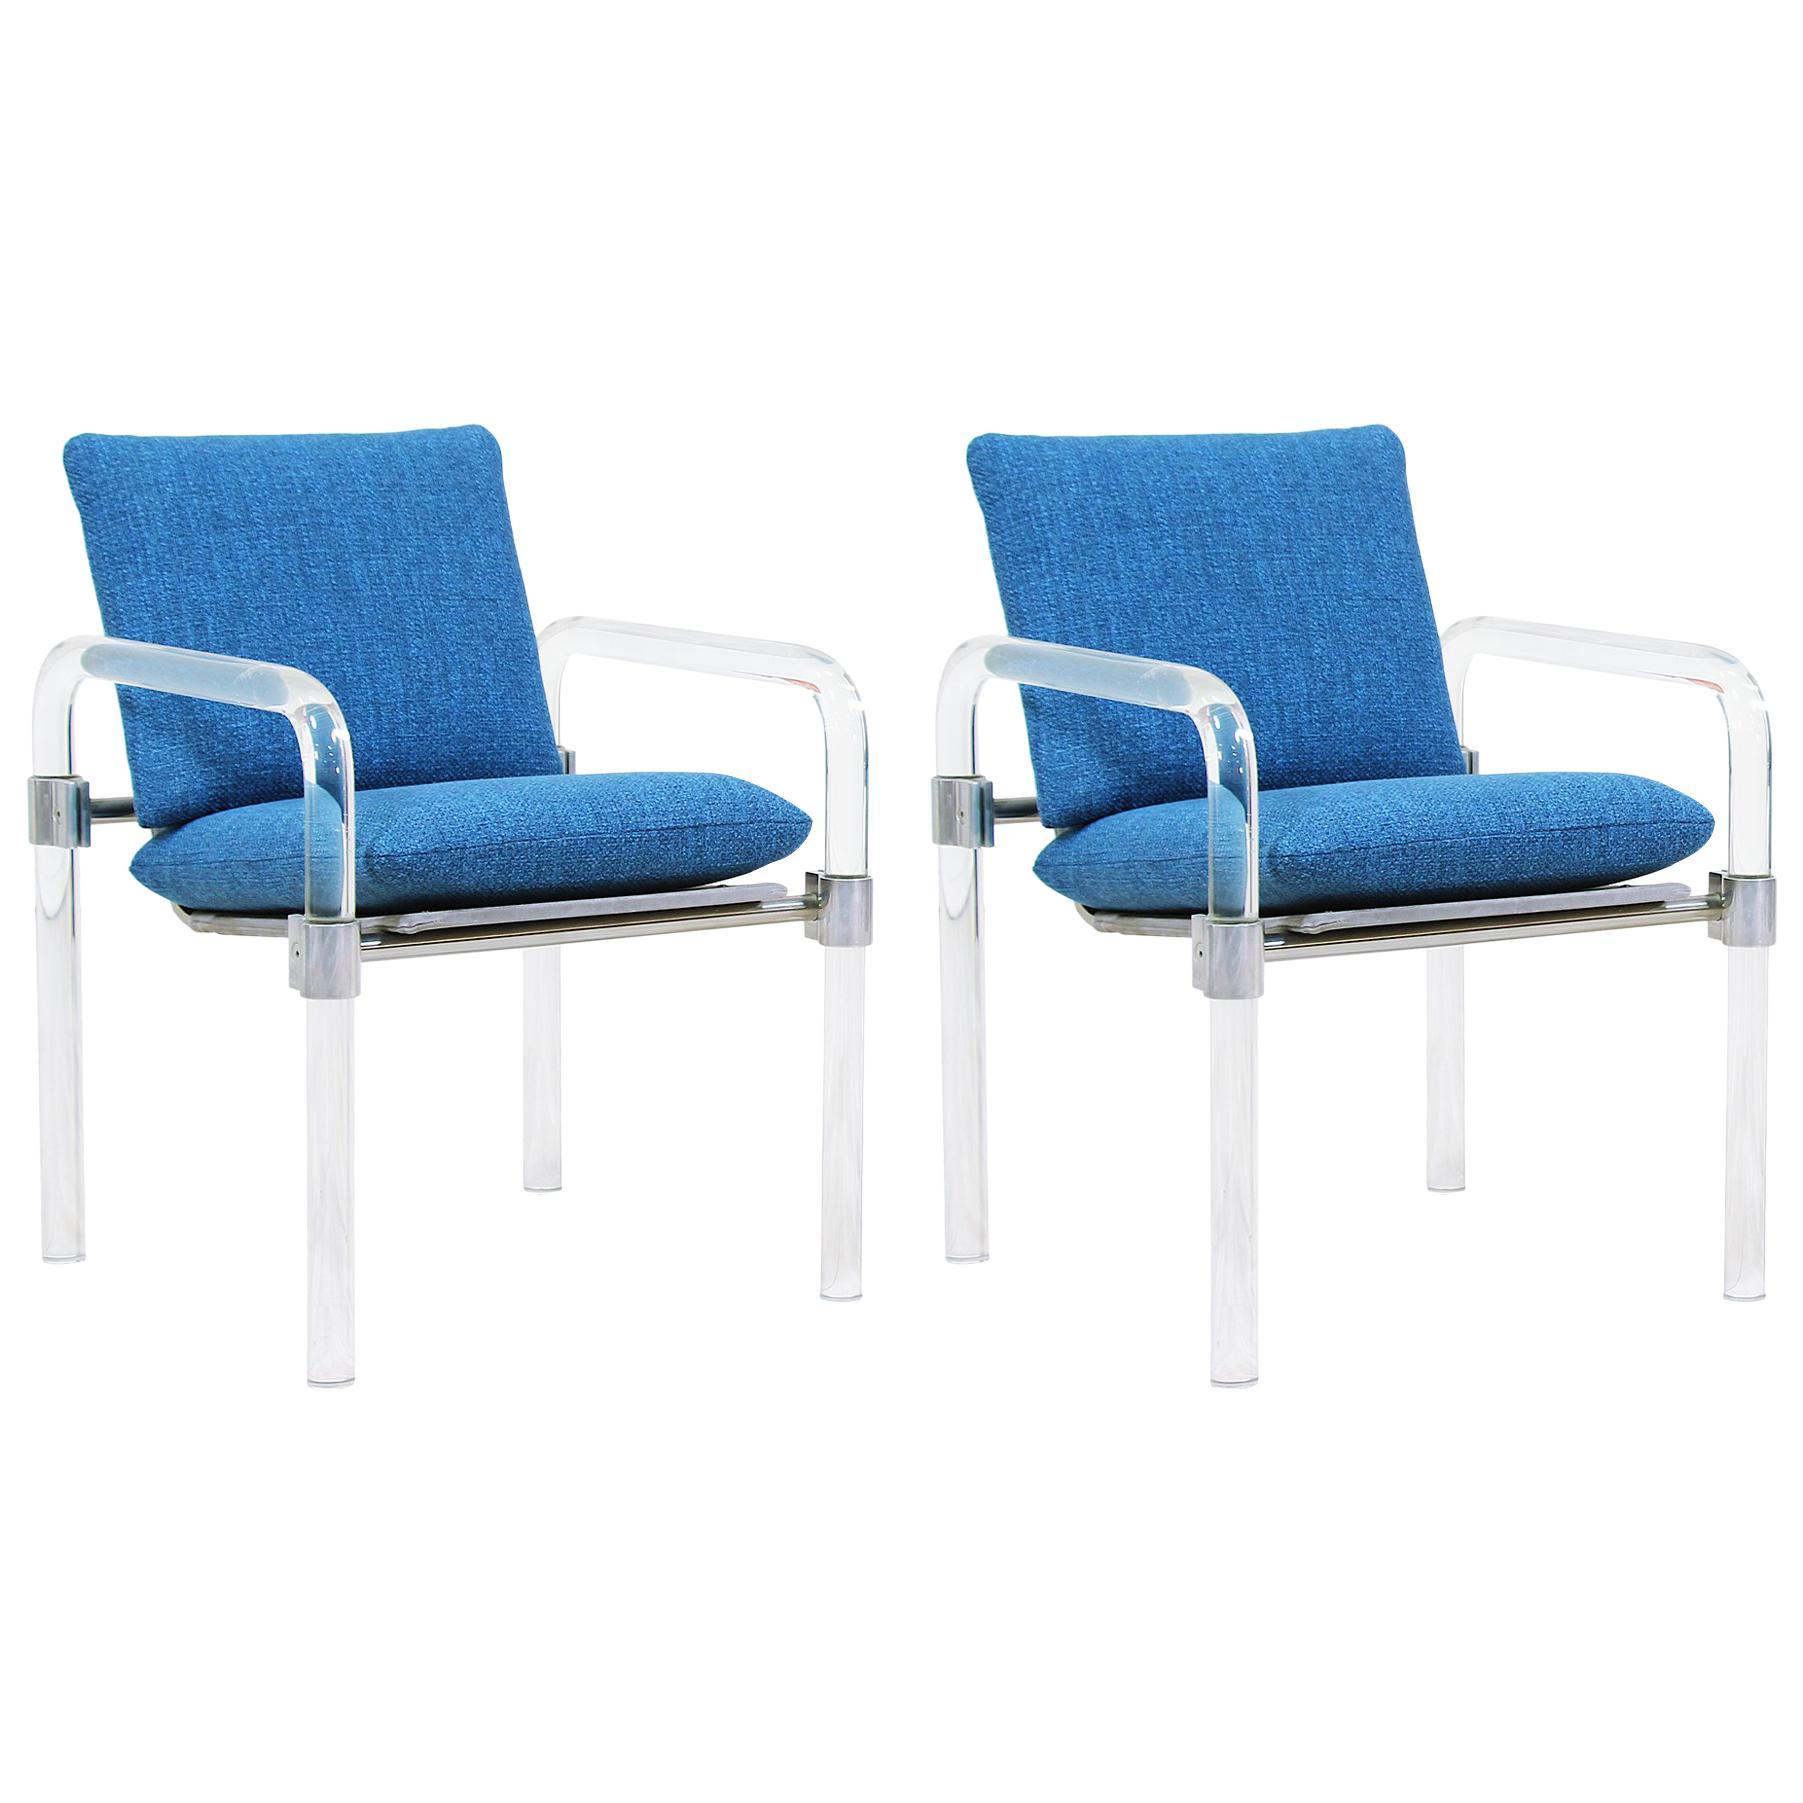 Mid-Century Modern Pipe Line Series II Armchairs by Jeff Messerschmidt